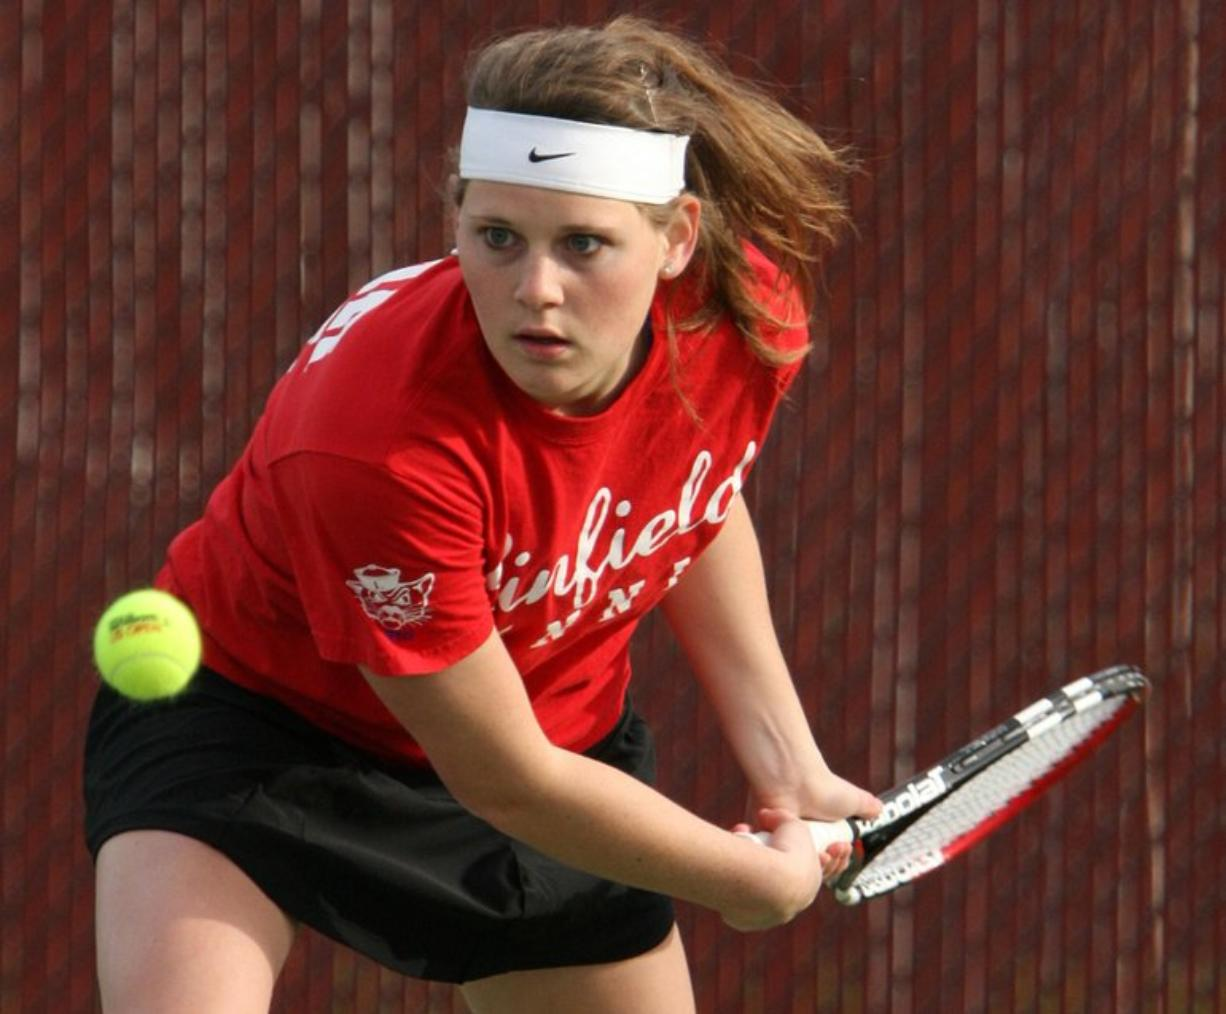 Sarah Click, Linfield College tennis